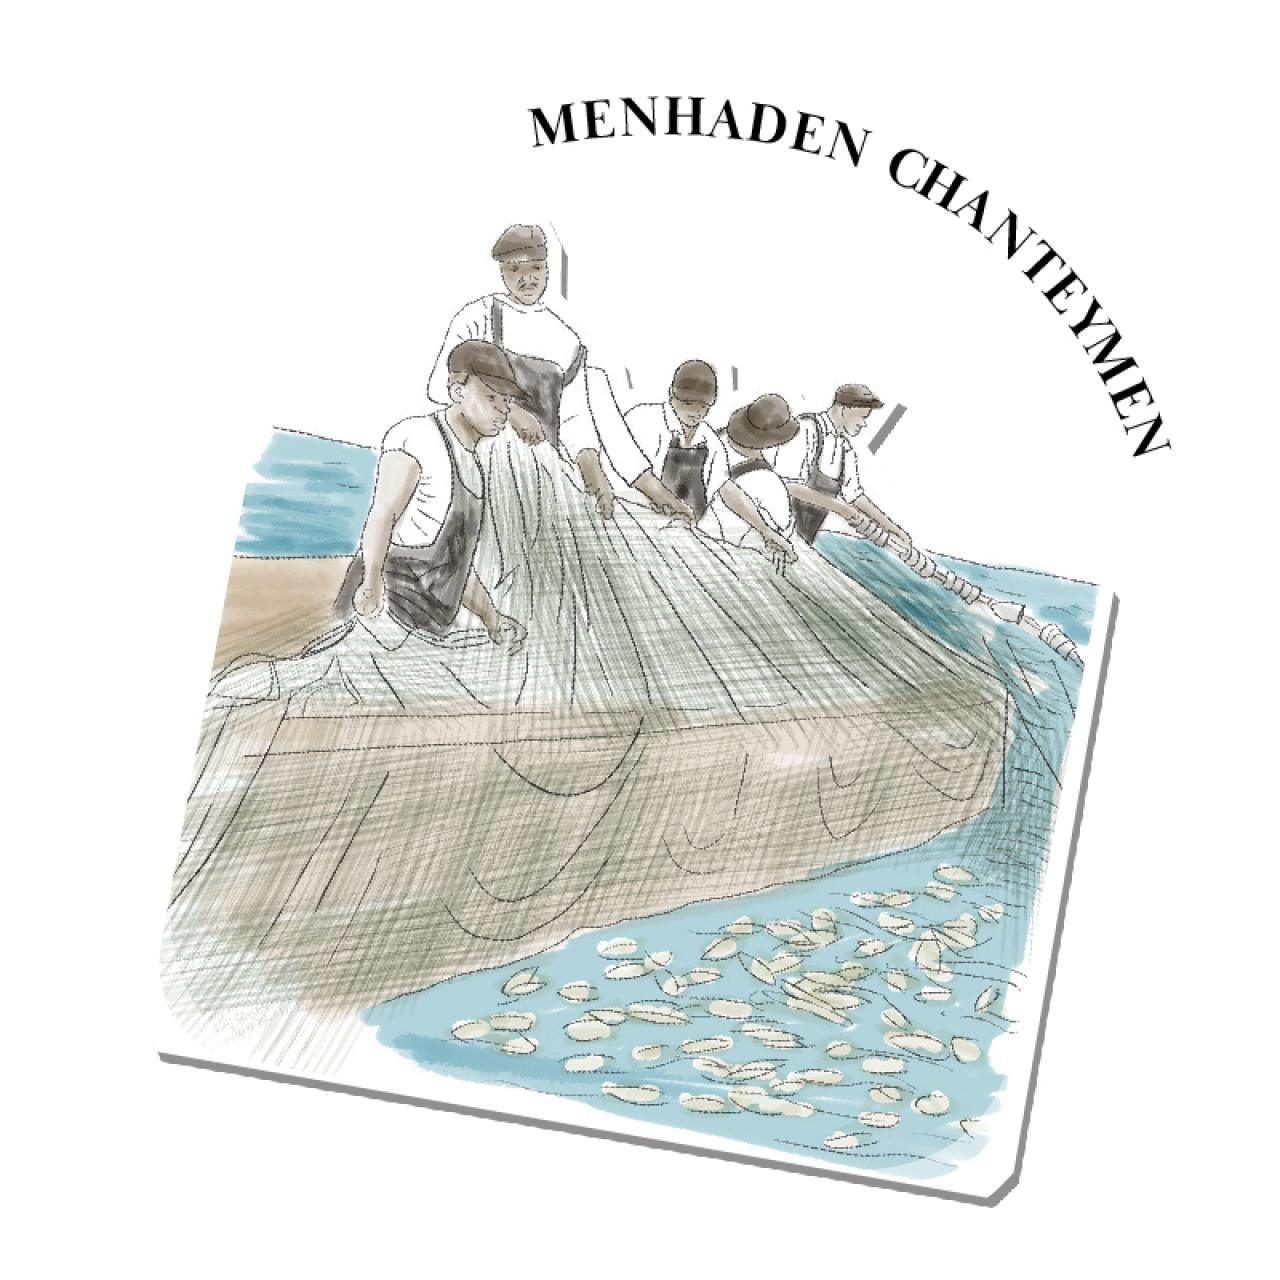 An illustration of Menhaden Chanteyman